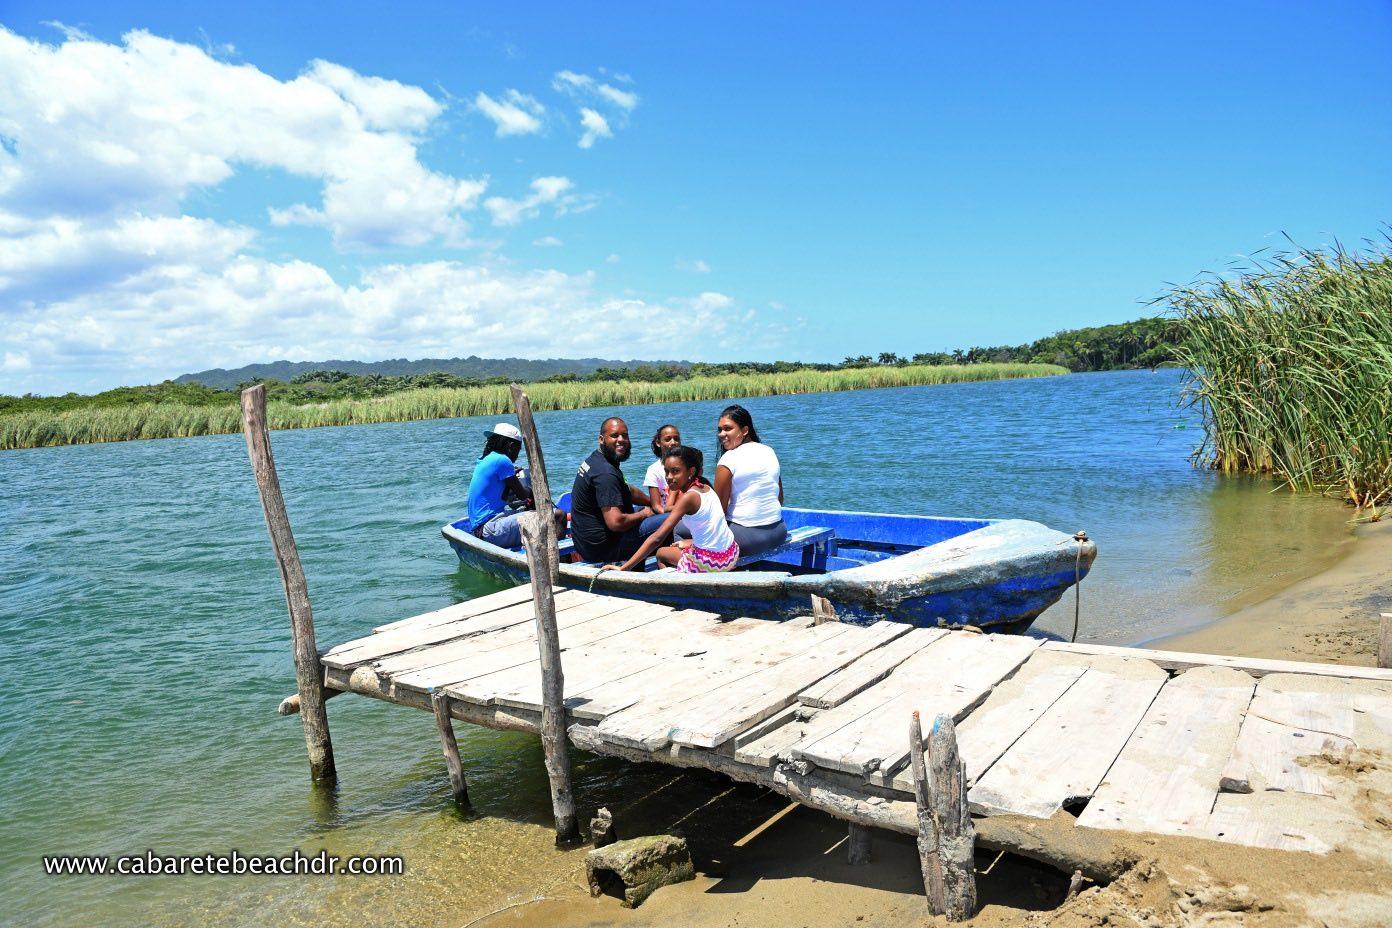 Visitors take the boat at La Boca